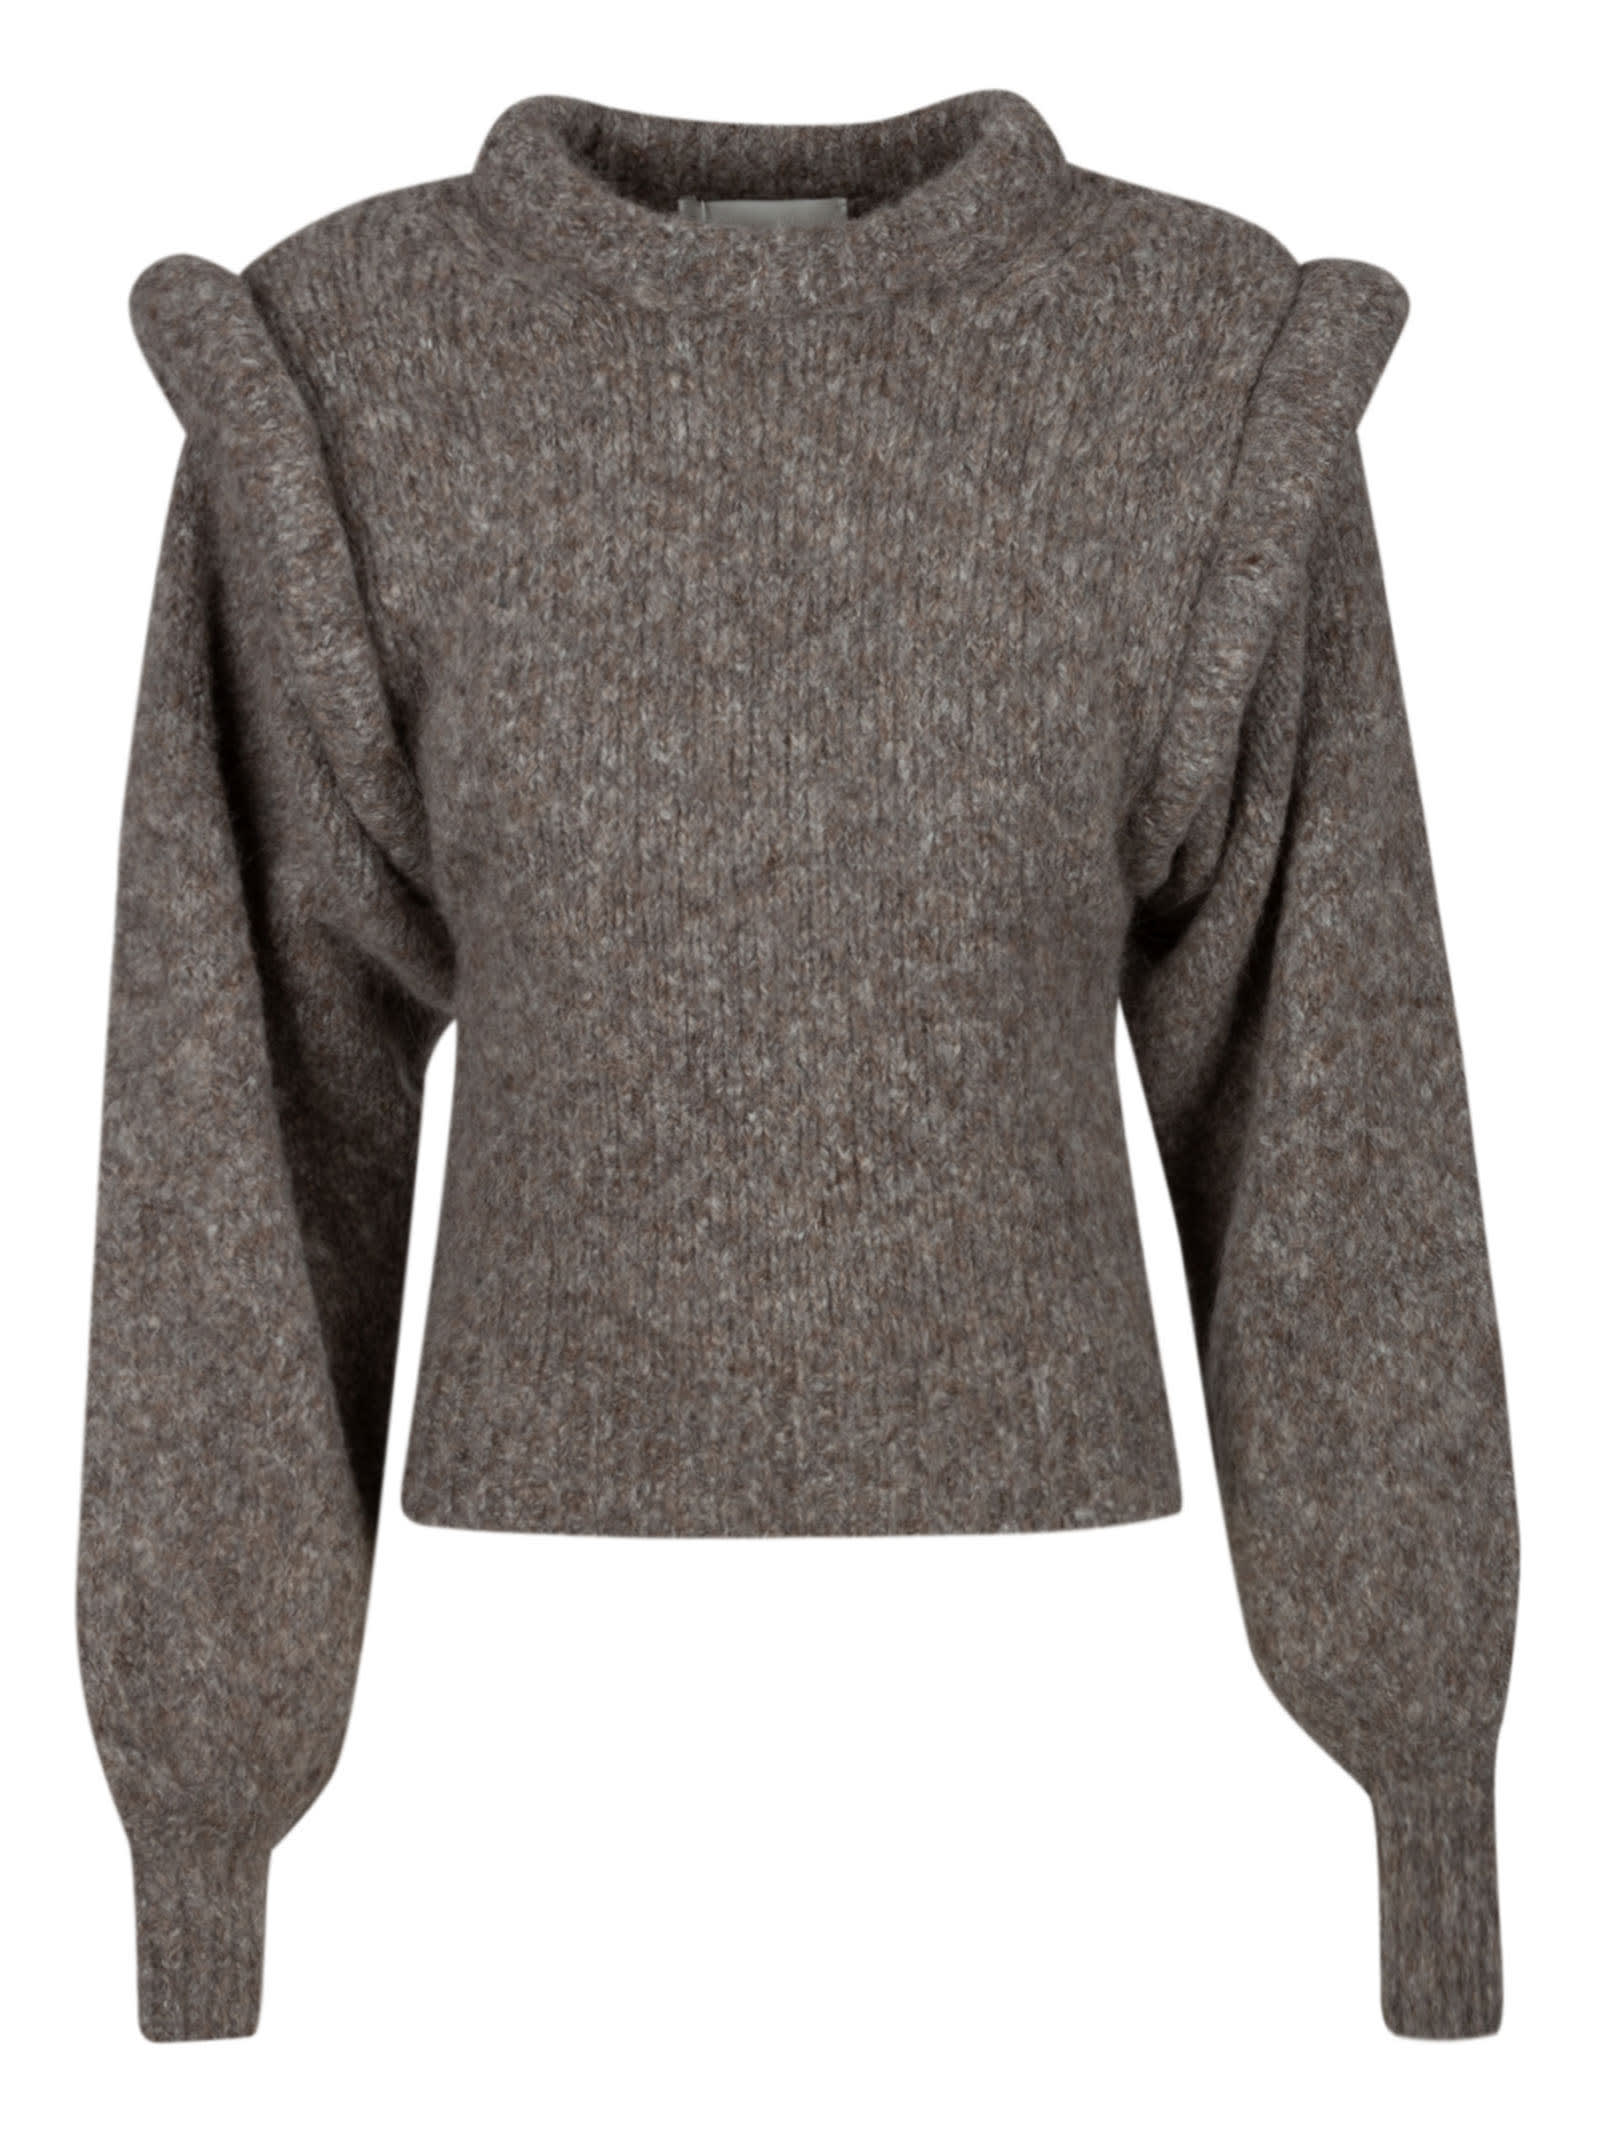 Blakey Sweater